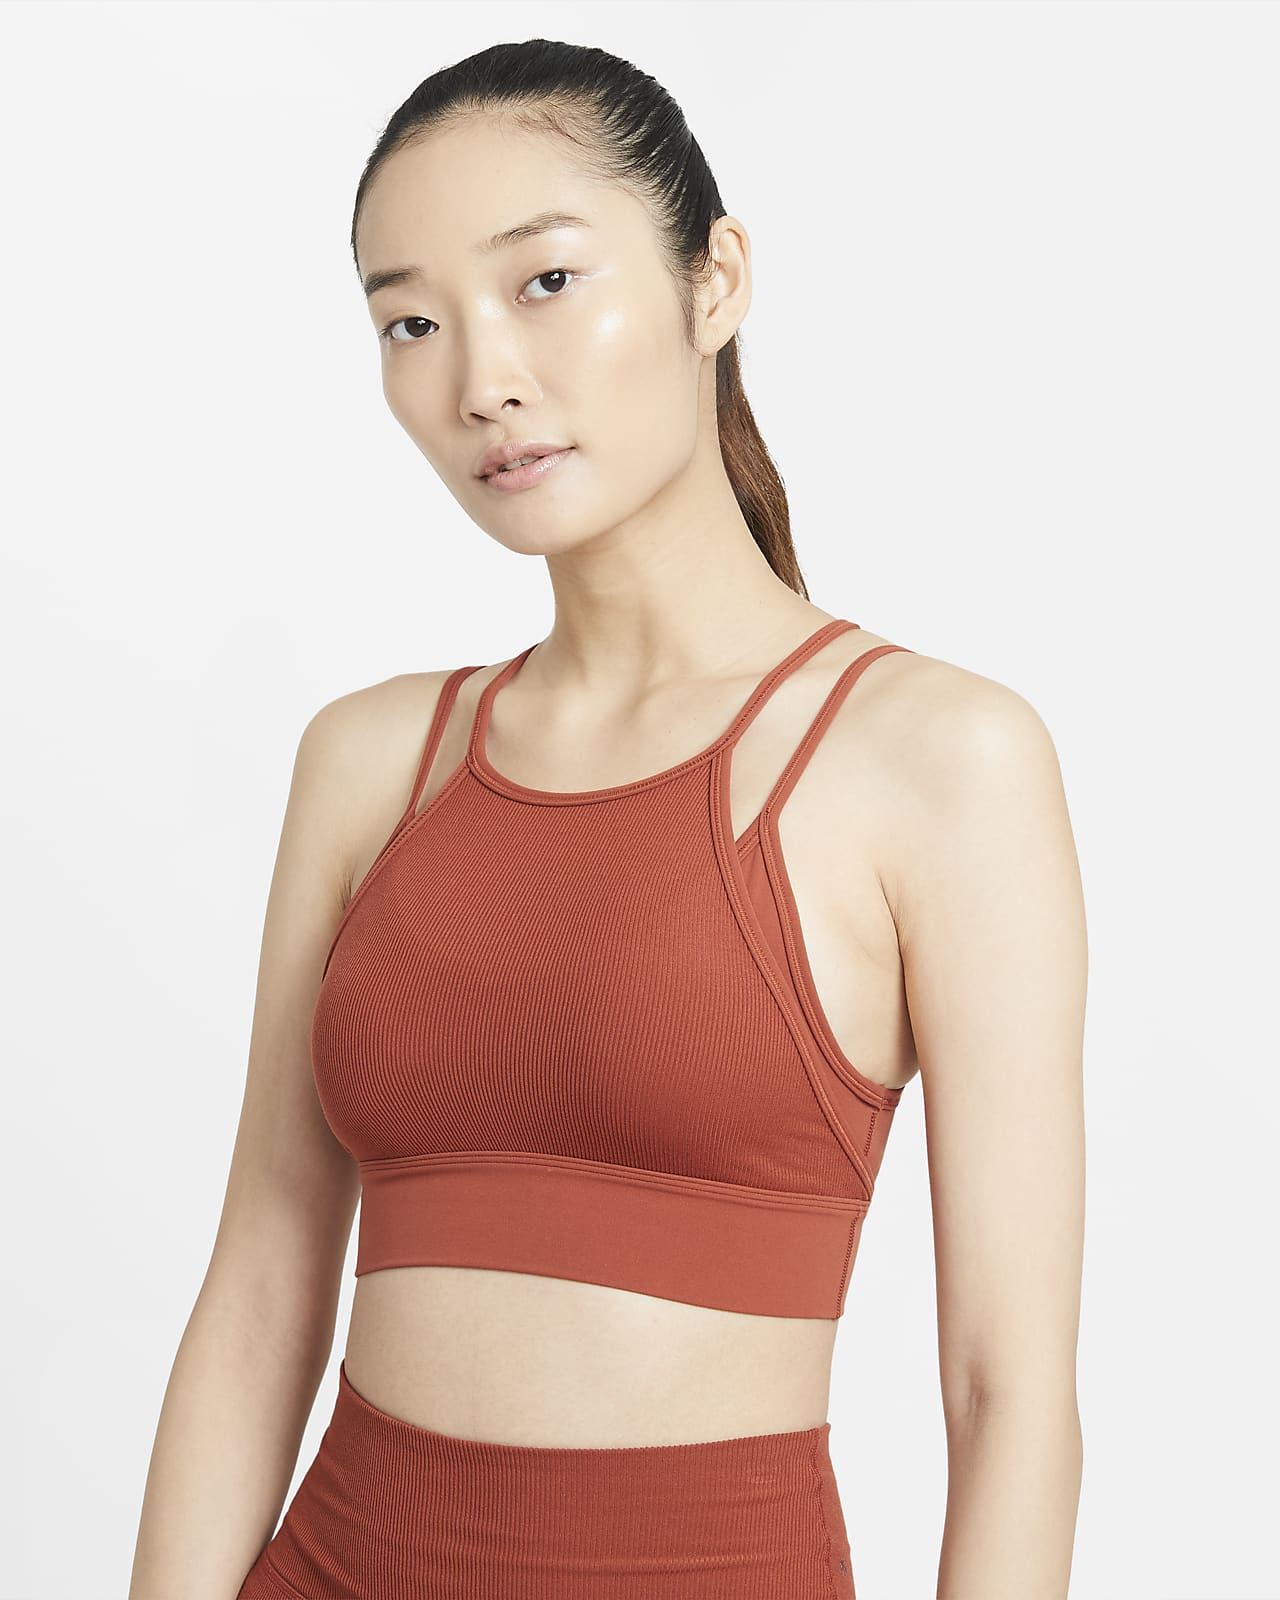 Nike Yoga Indy Novelty 女款輕度支撐型運動內衣